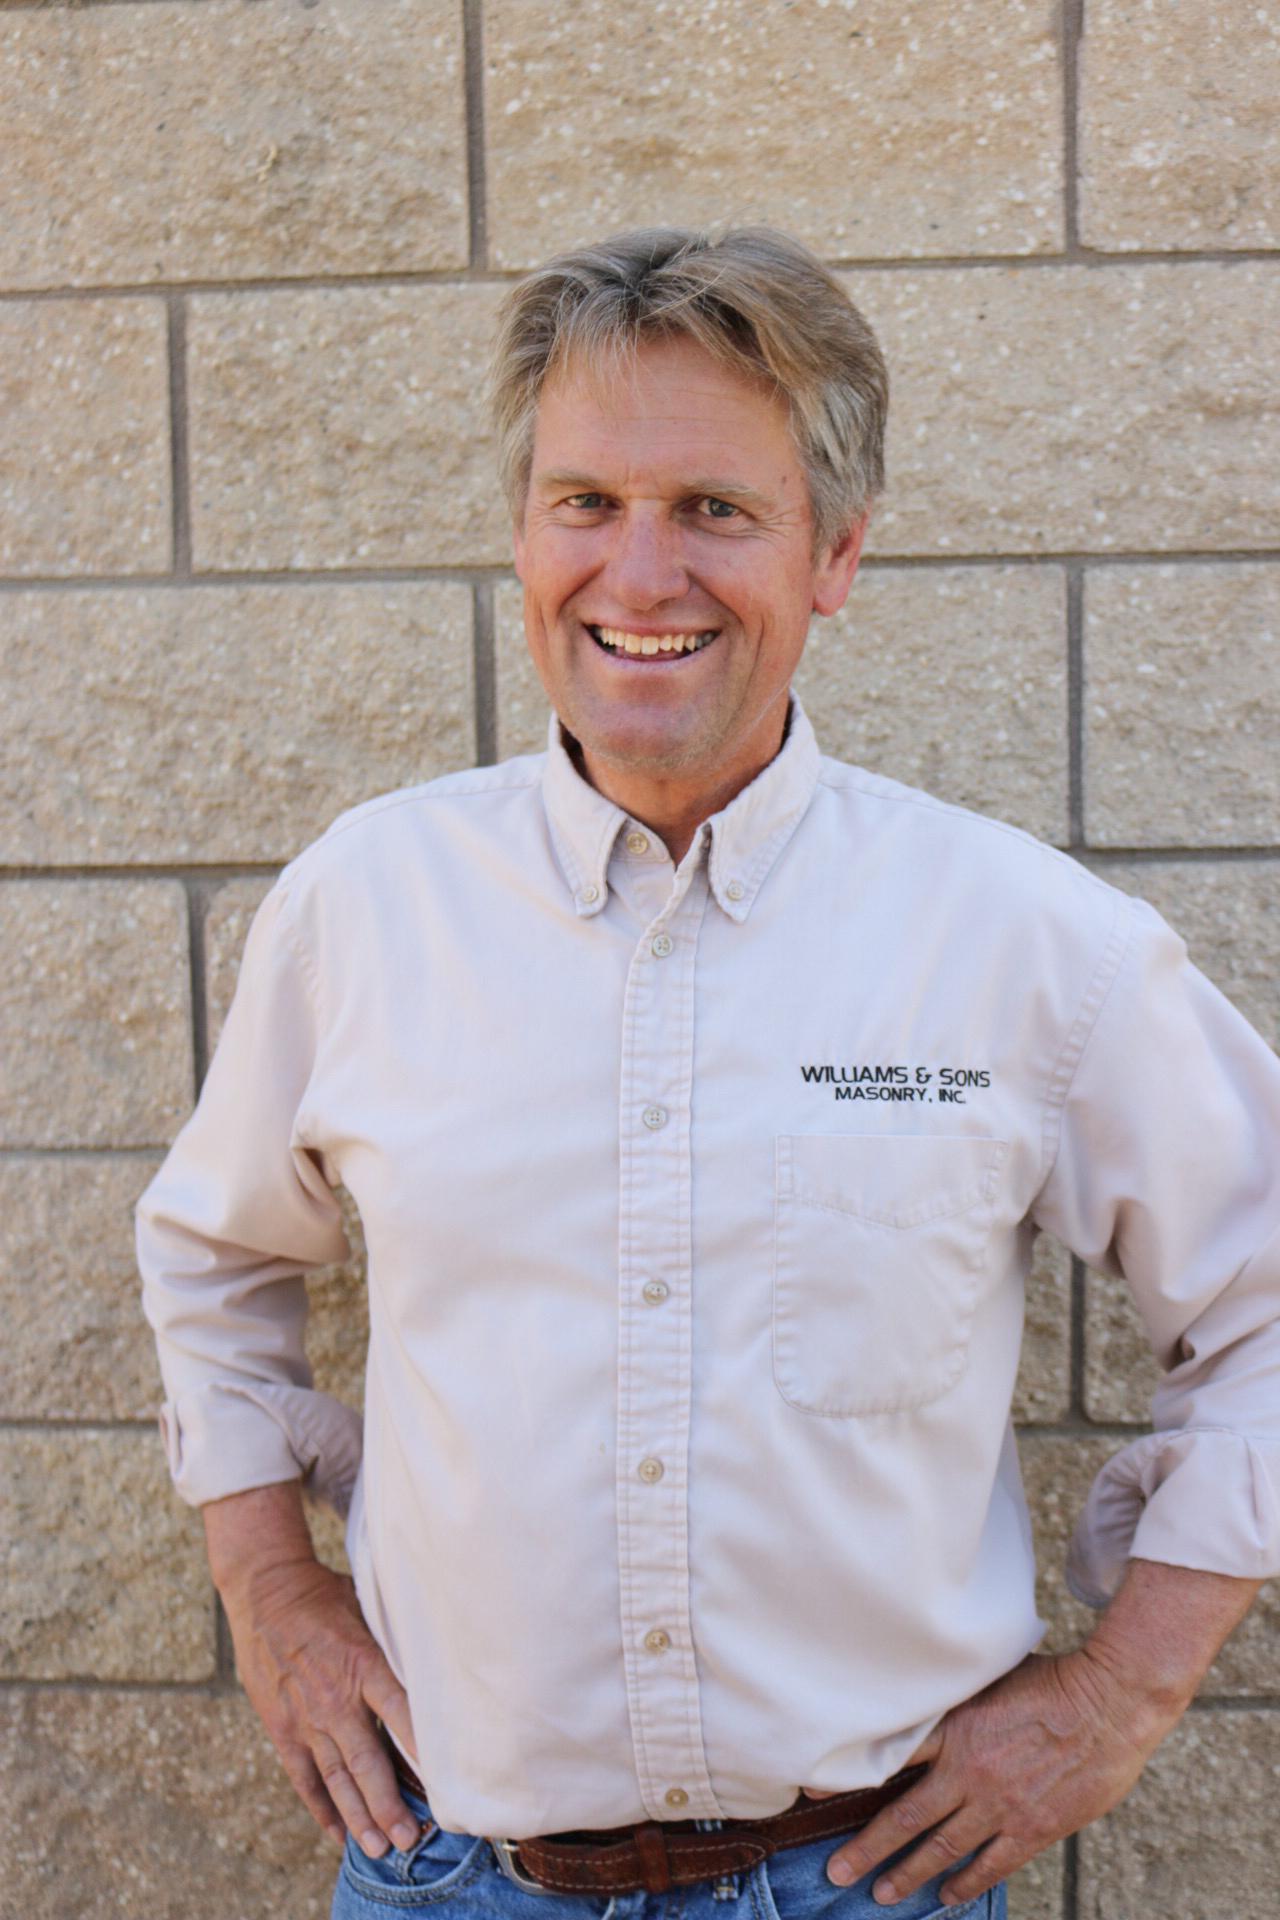 Todd Williams, President of Williams & Sons Masonry